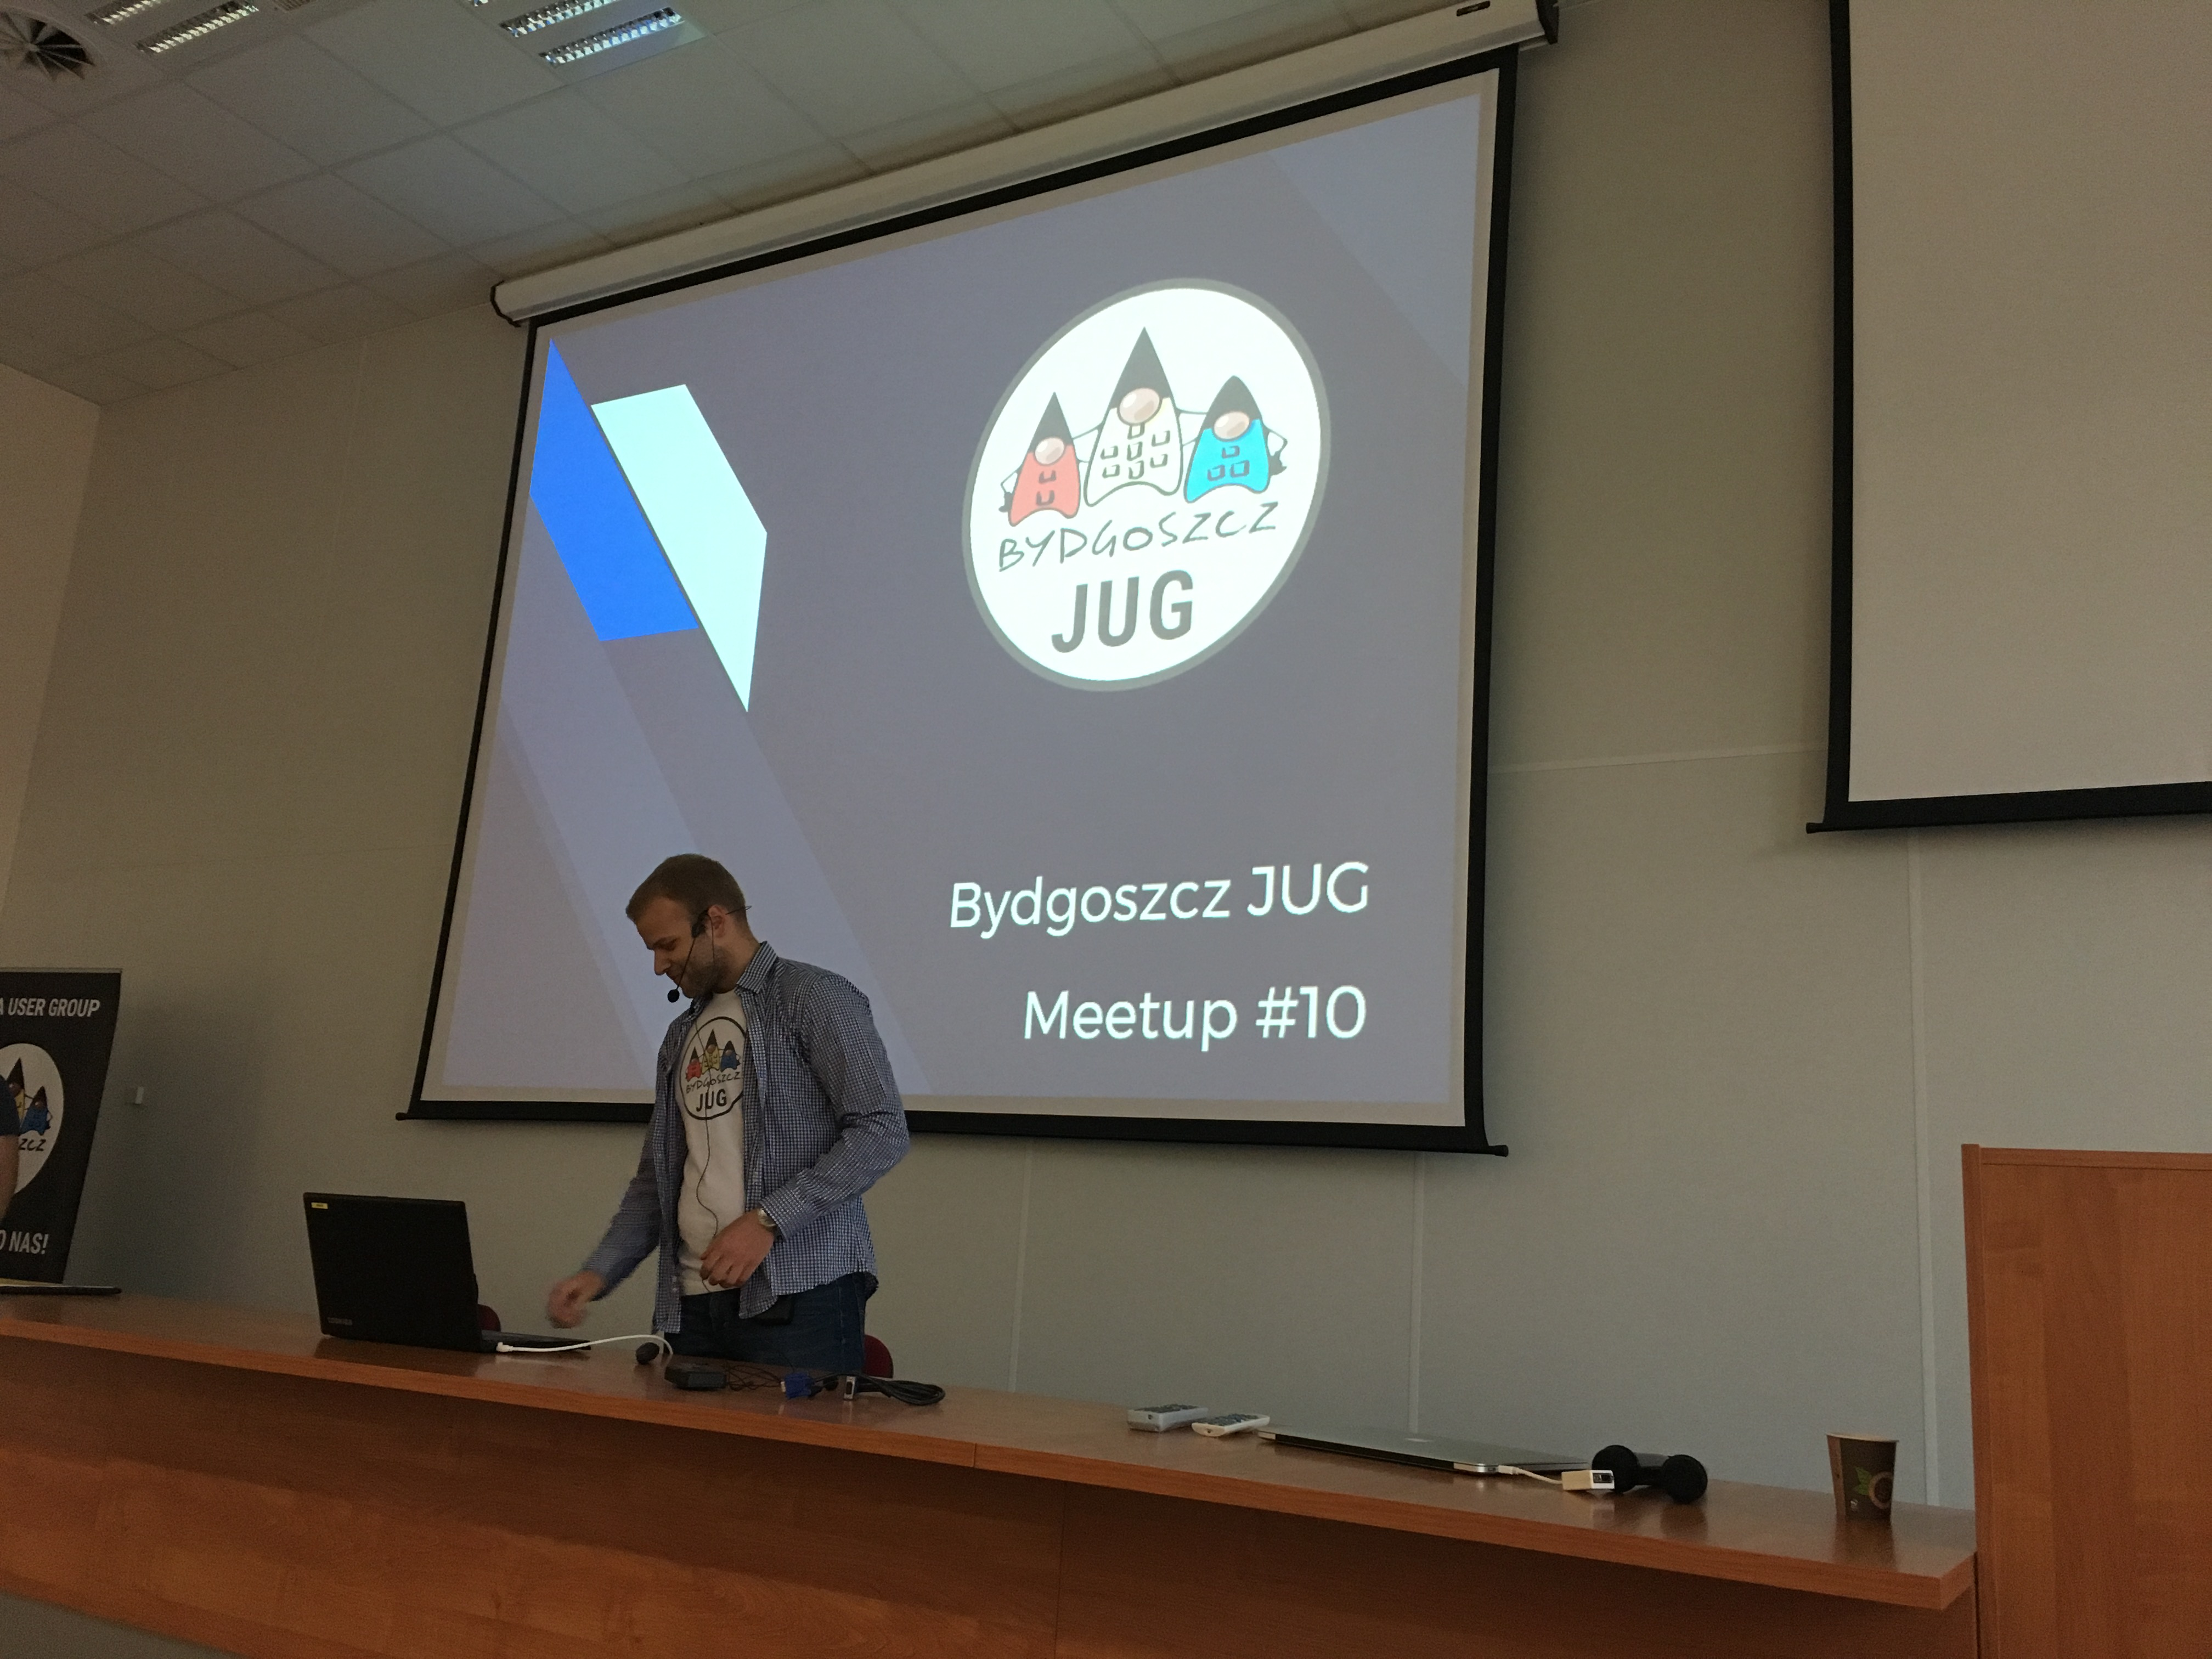 Bydgoszcz JUG – meetup #10